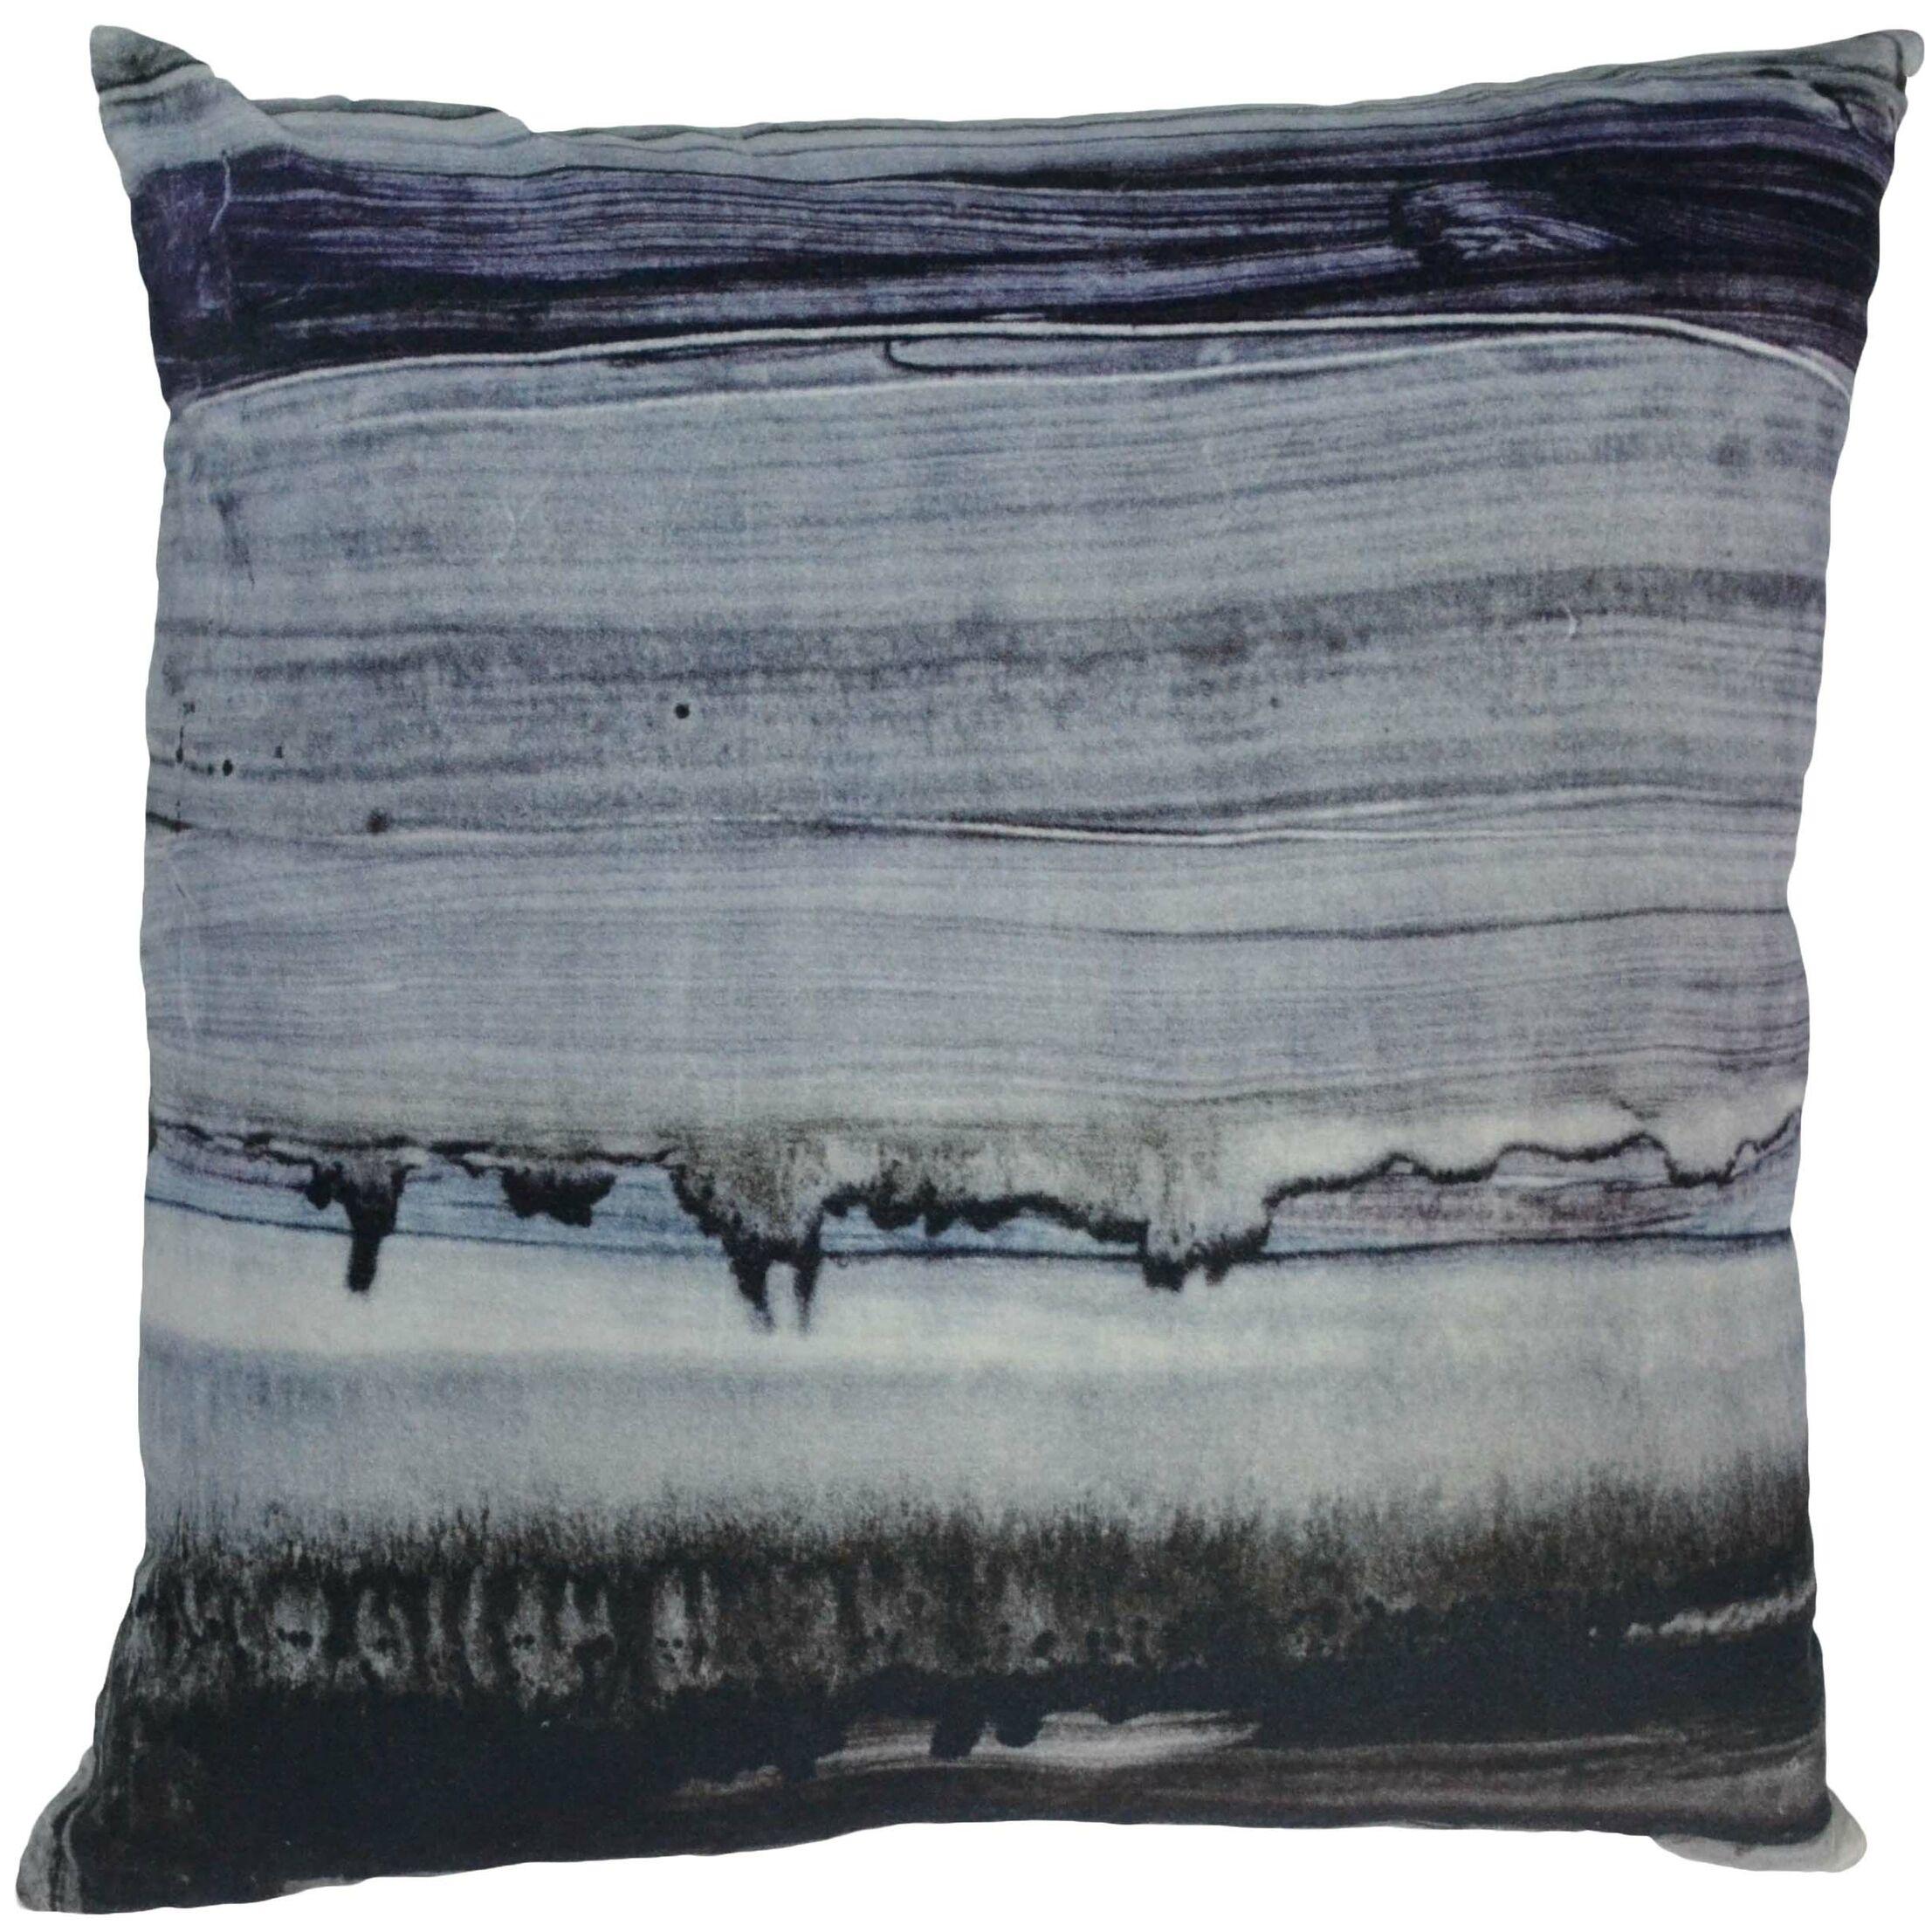 Parallel Lines Velvet Throw Pillow